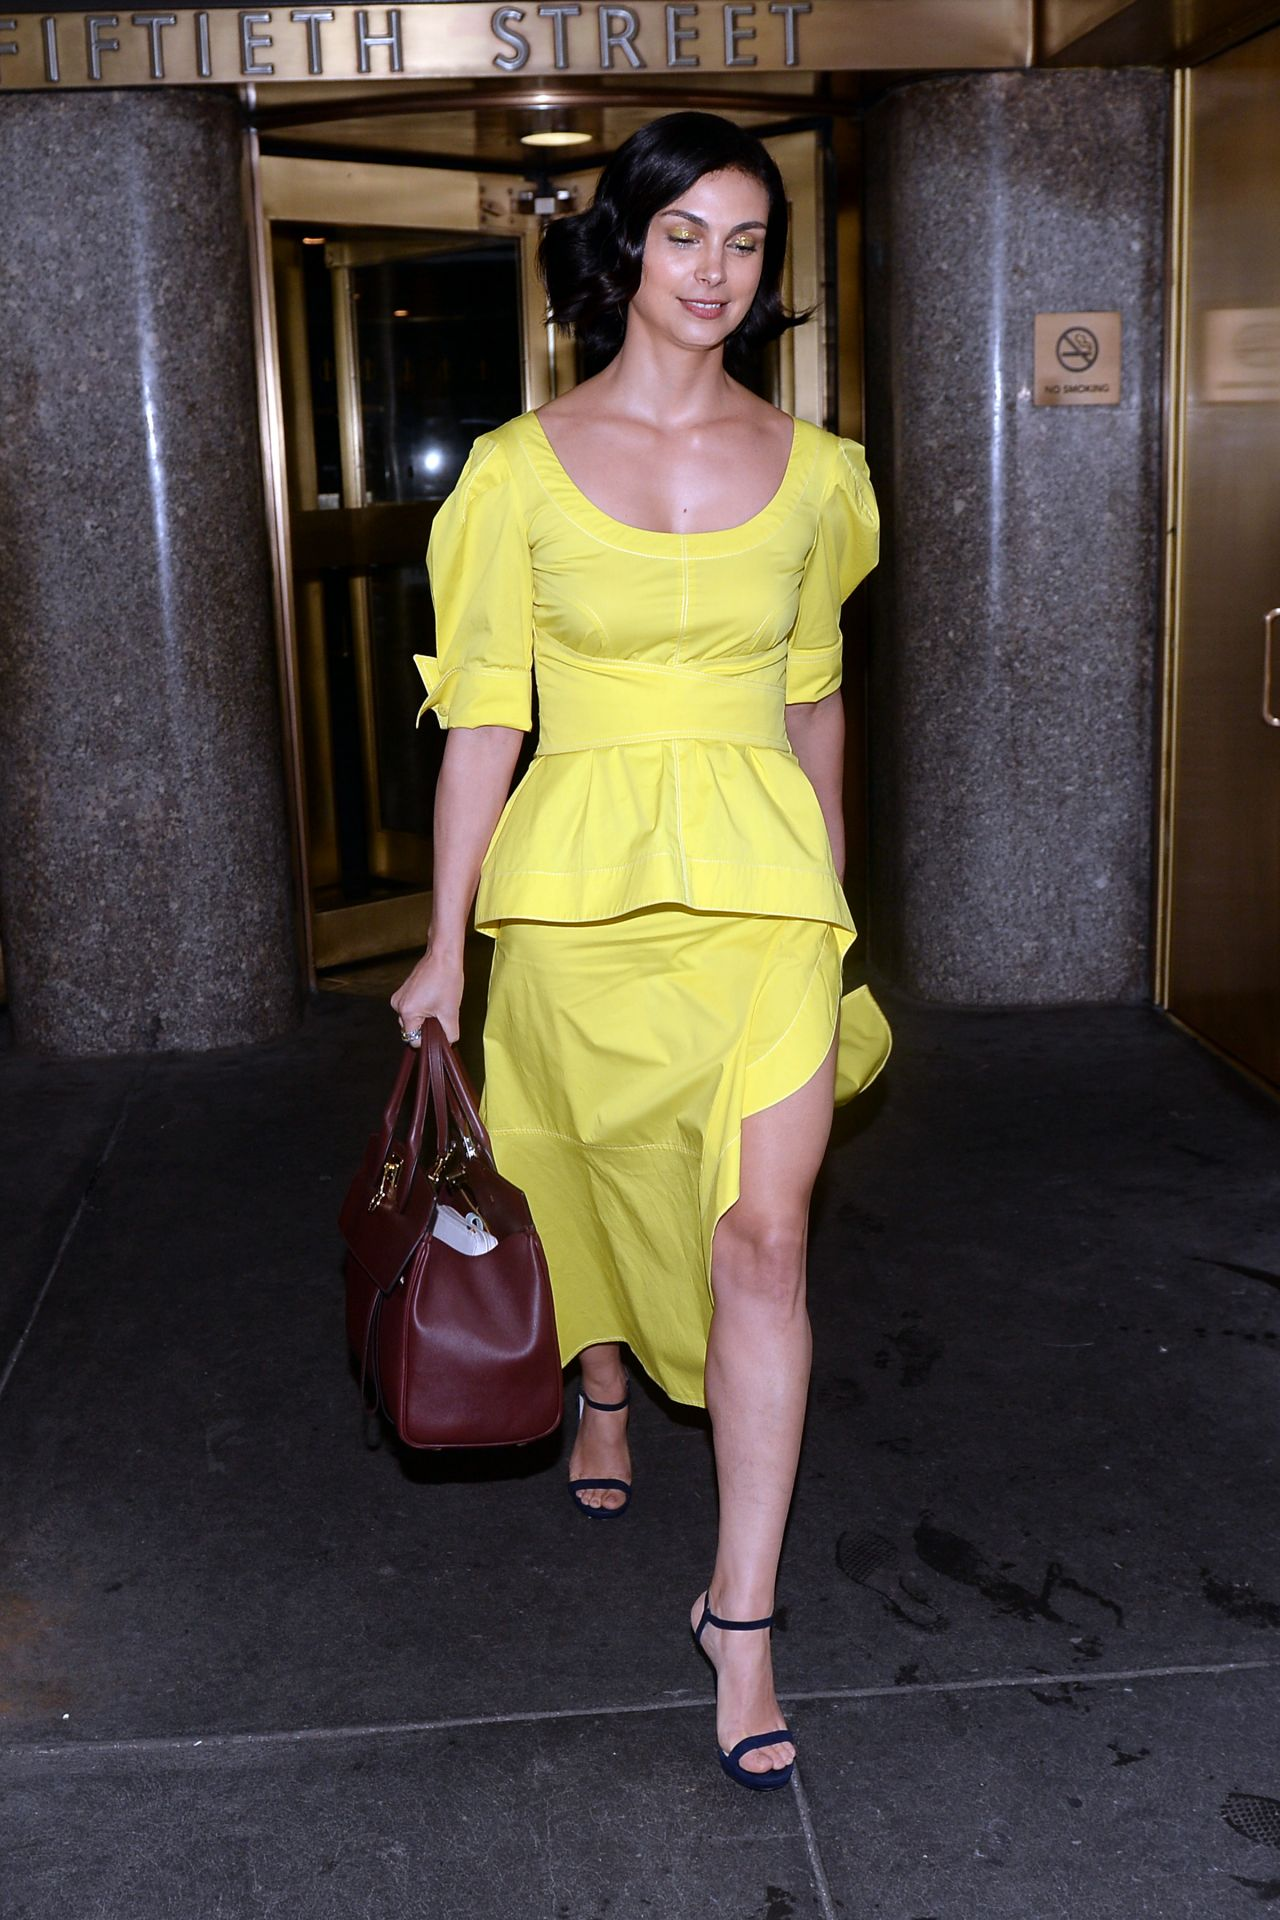 Morena Baccarin Leaving Nbc Studios In New York City 05